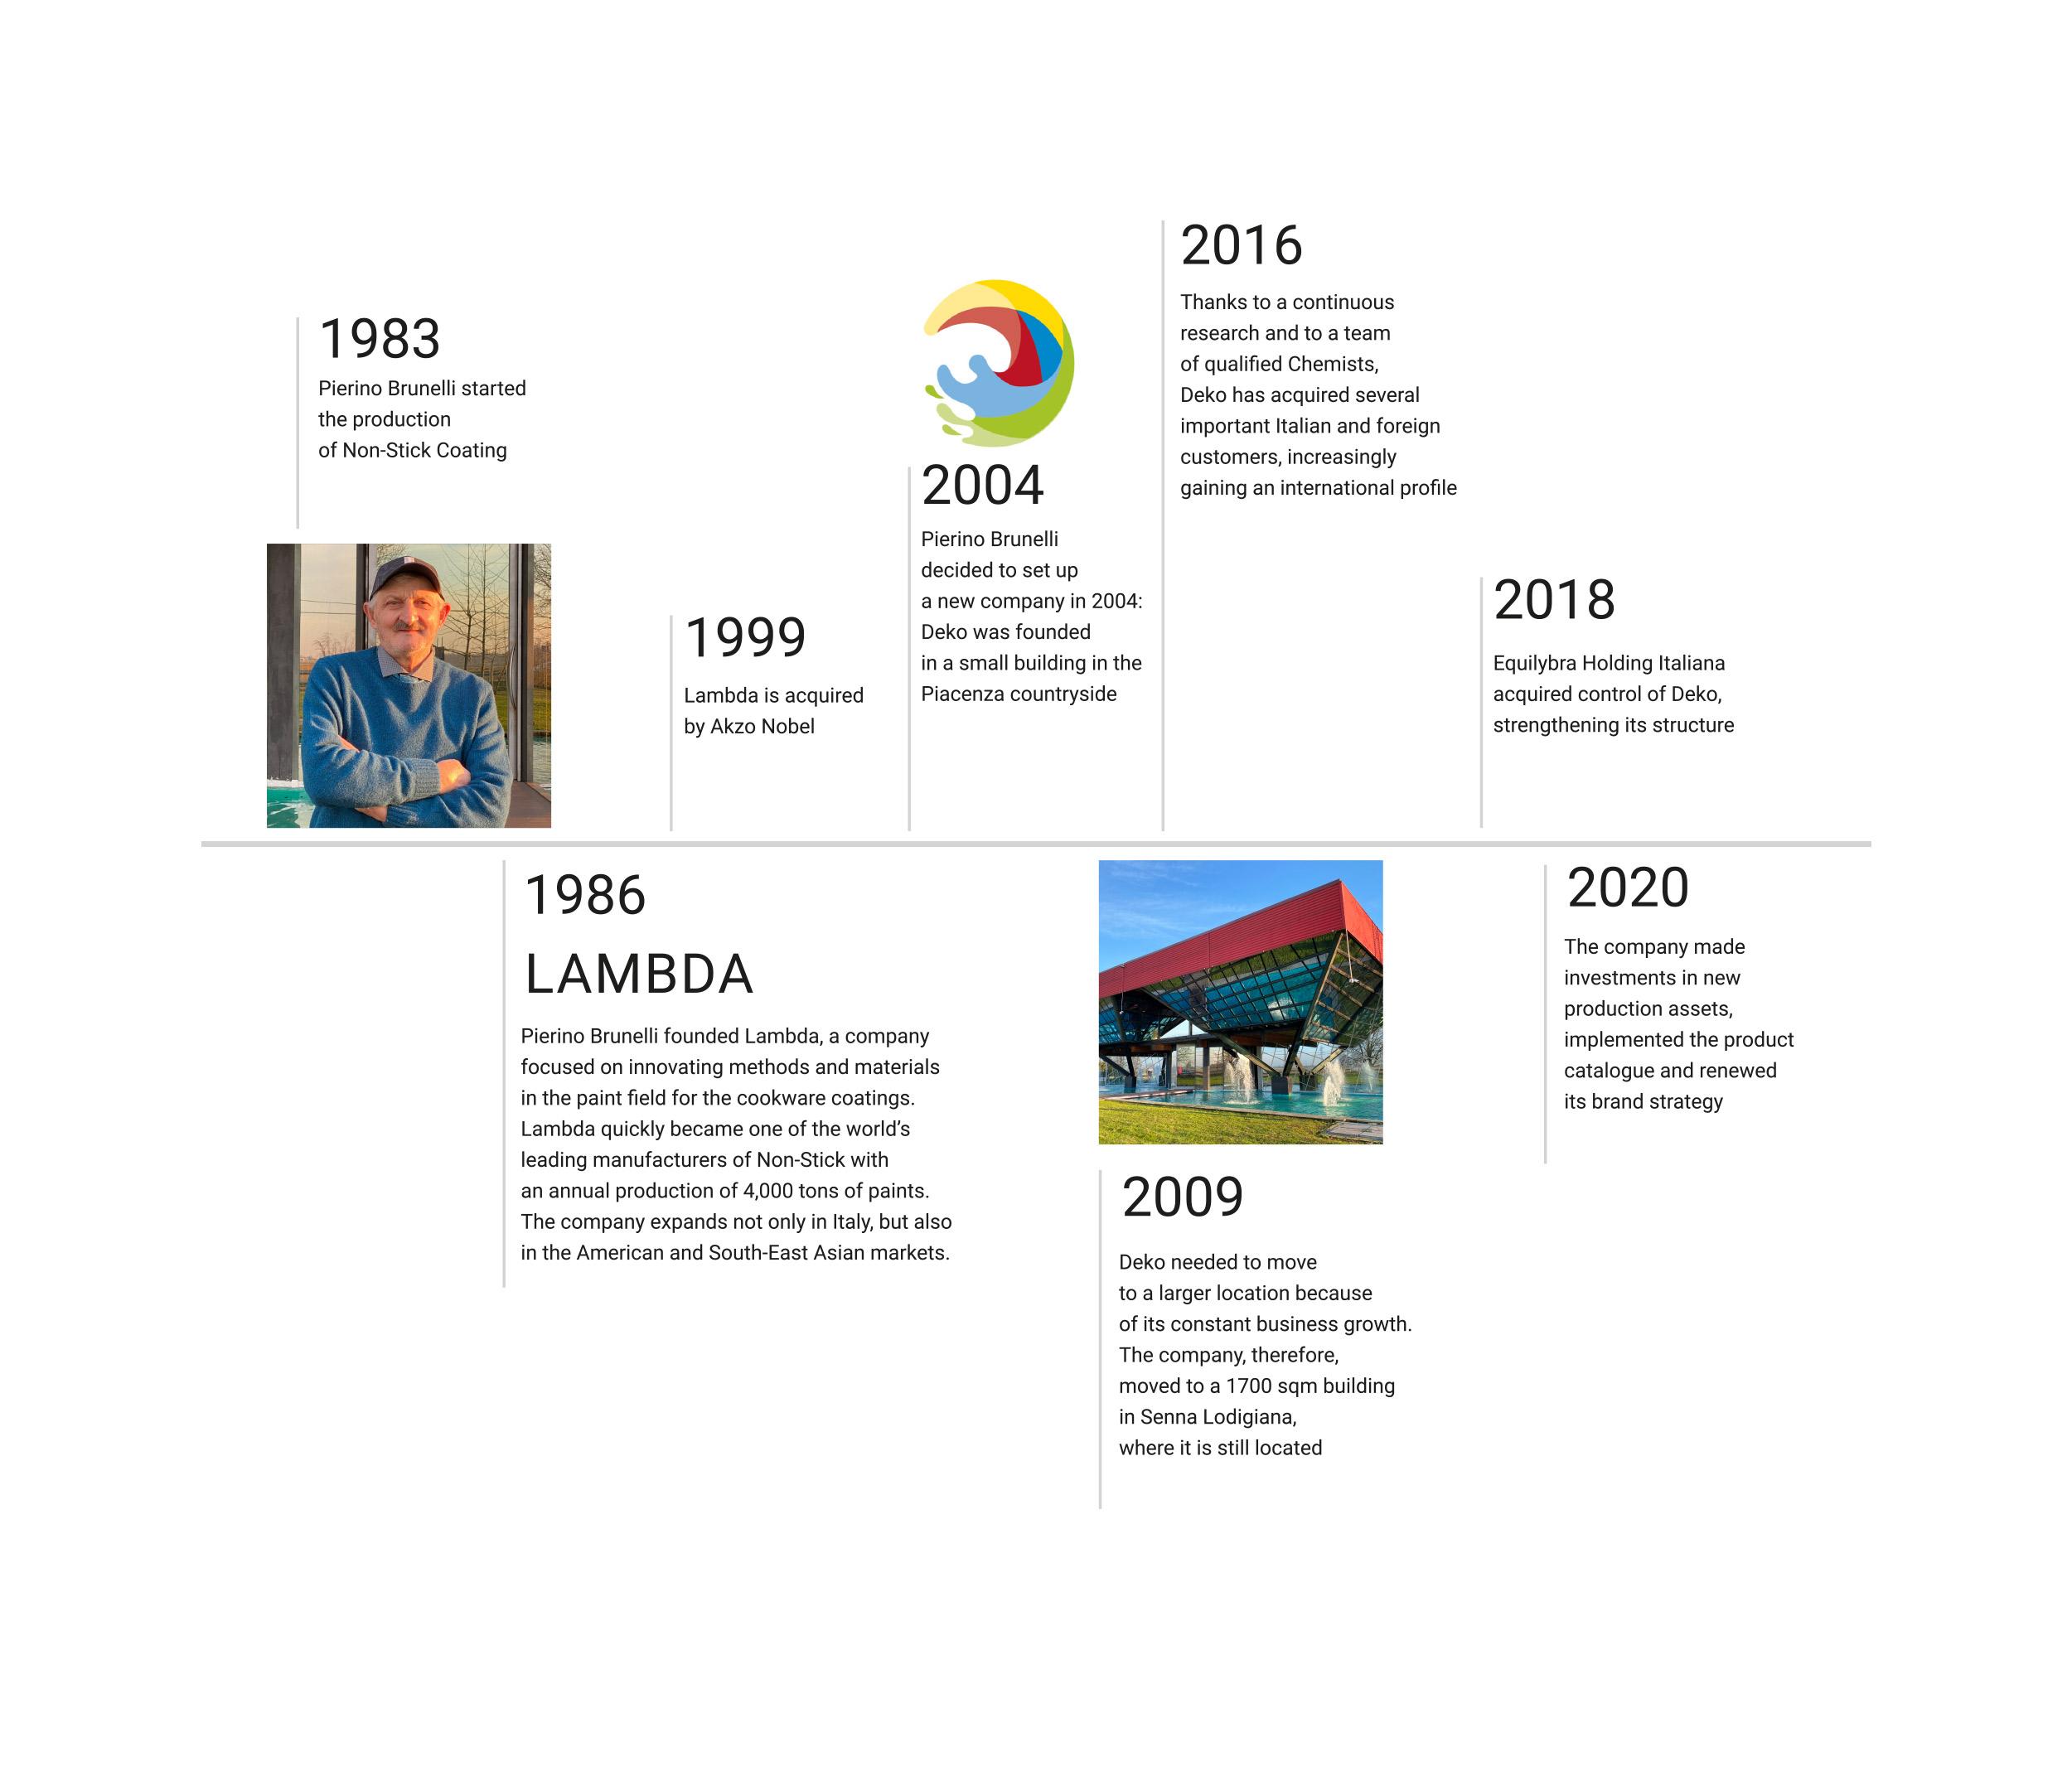 https://www.dekosrl.com/wp-content/uploads/2021/02/Storia-x-sito-ING-1.jpg